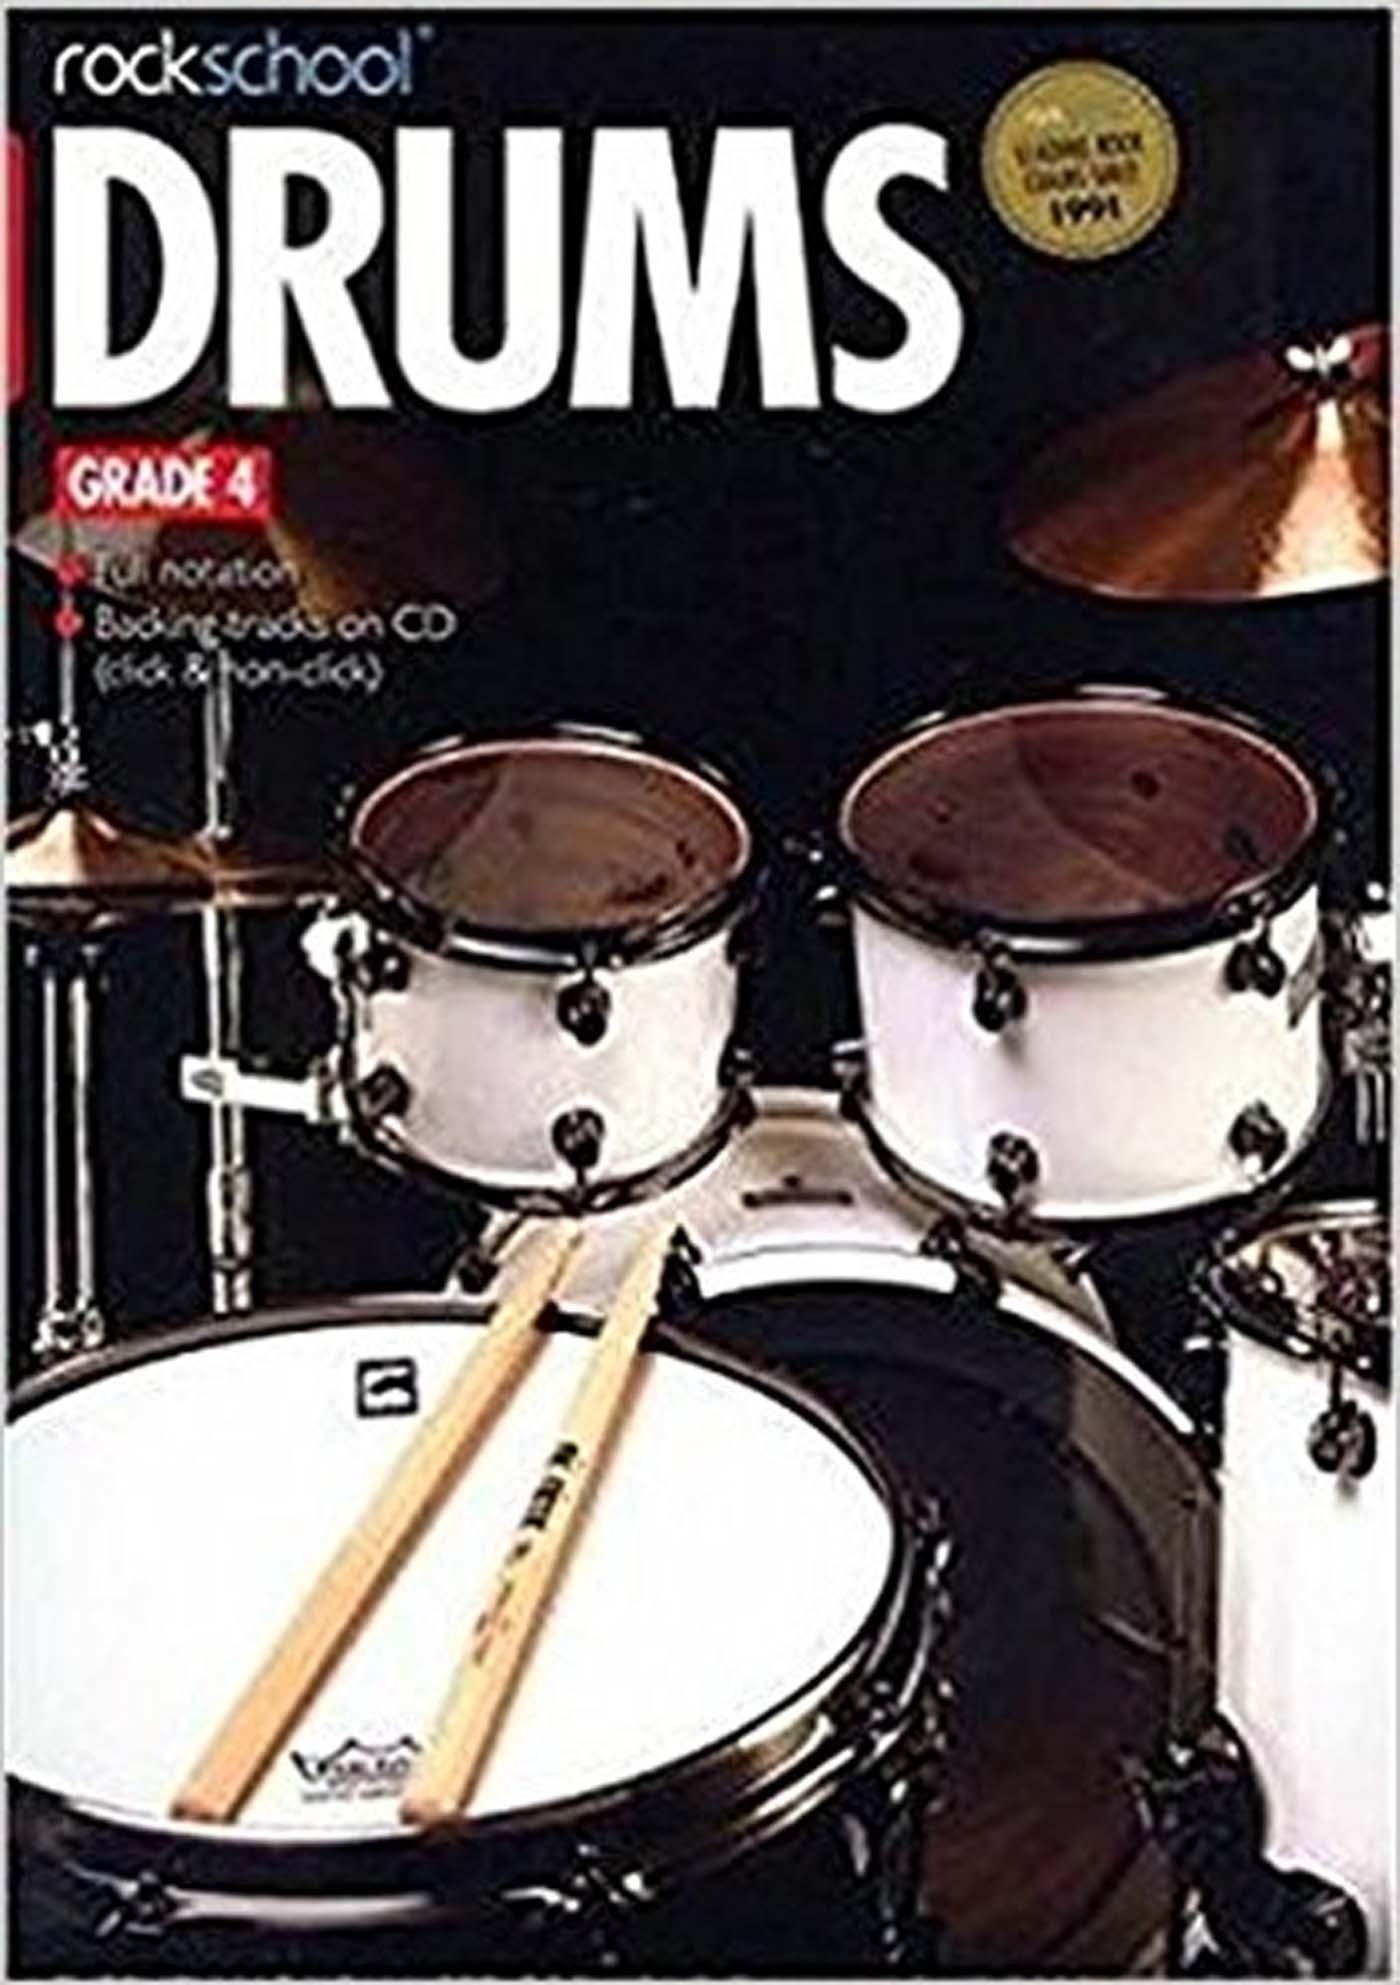 Rockschool Drums Grade 4 Book & CD for Exams S162